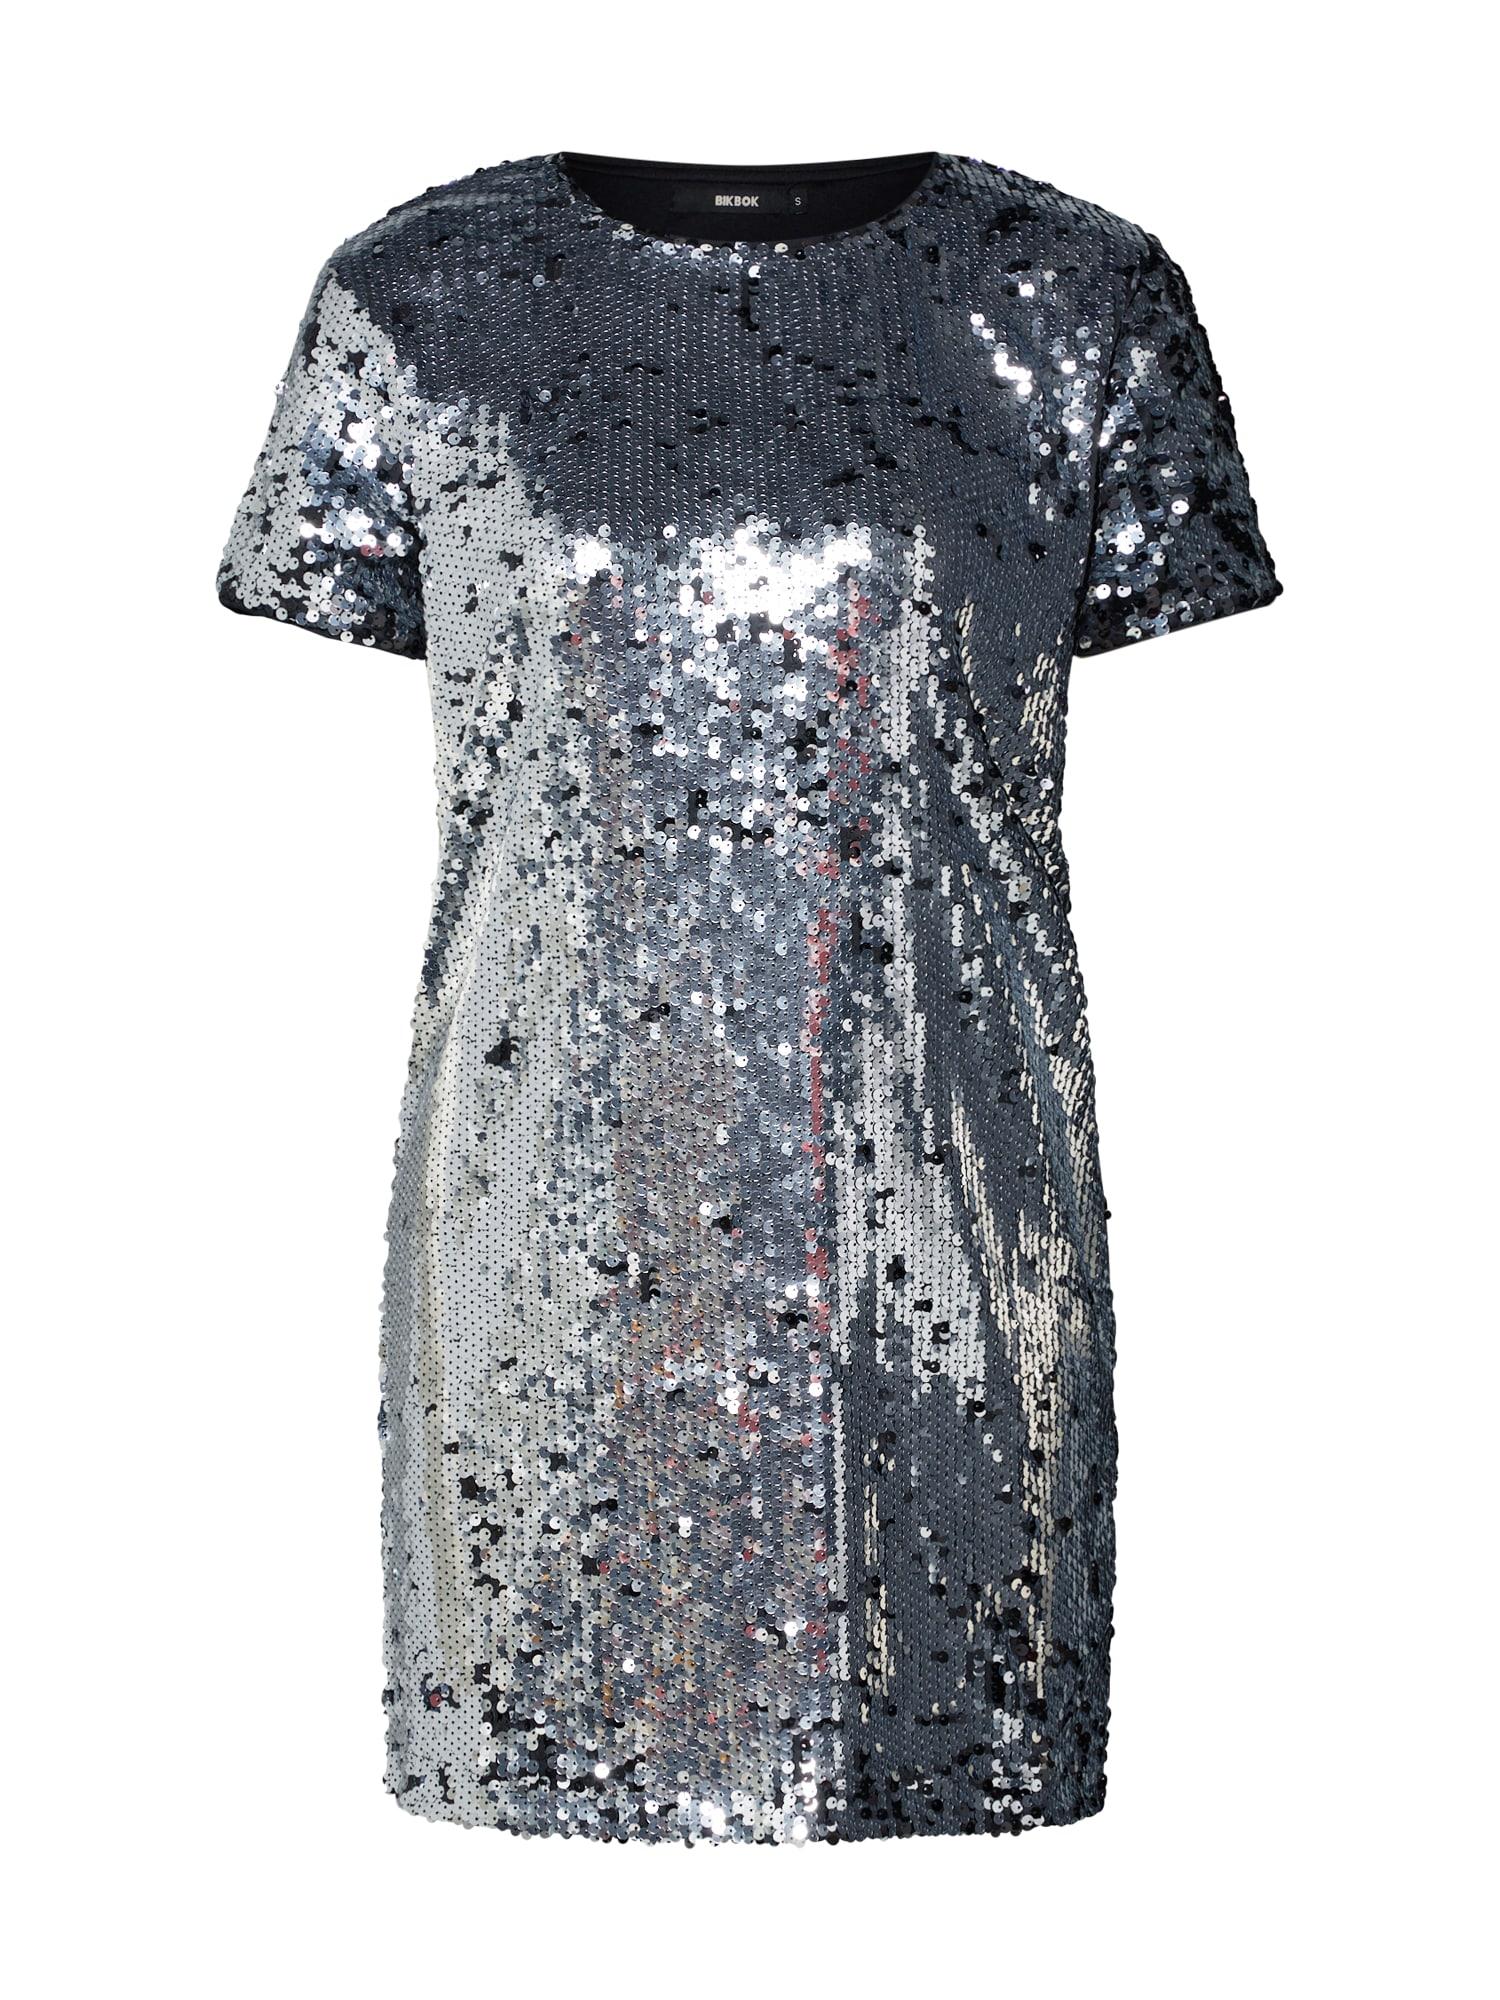 Koktejlové šaty DK SUSAN stříbrná Bik Bok